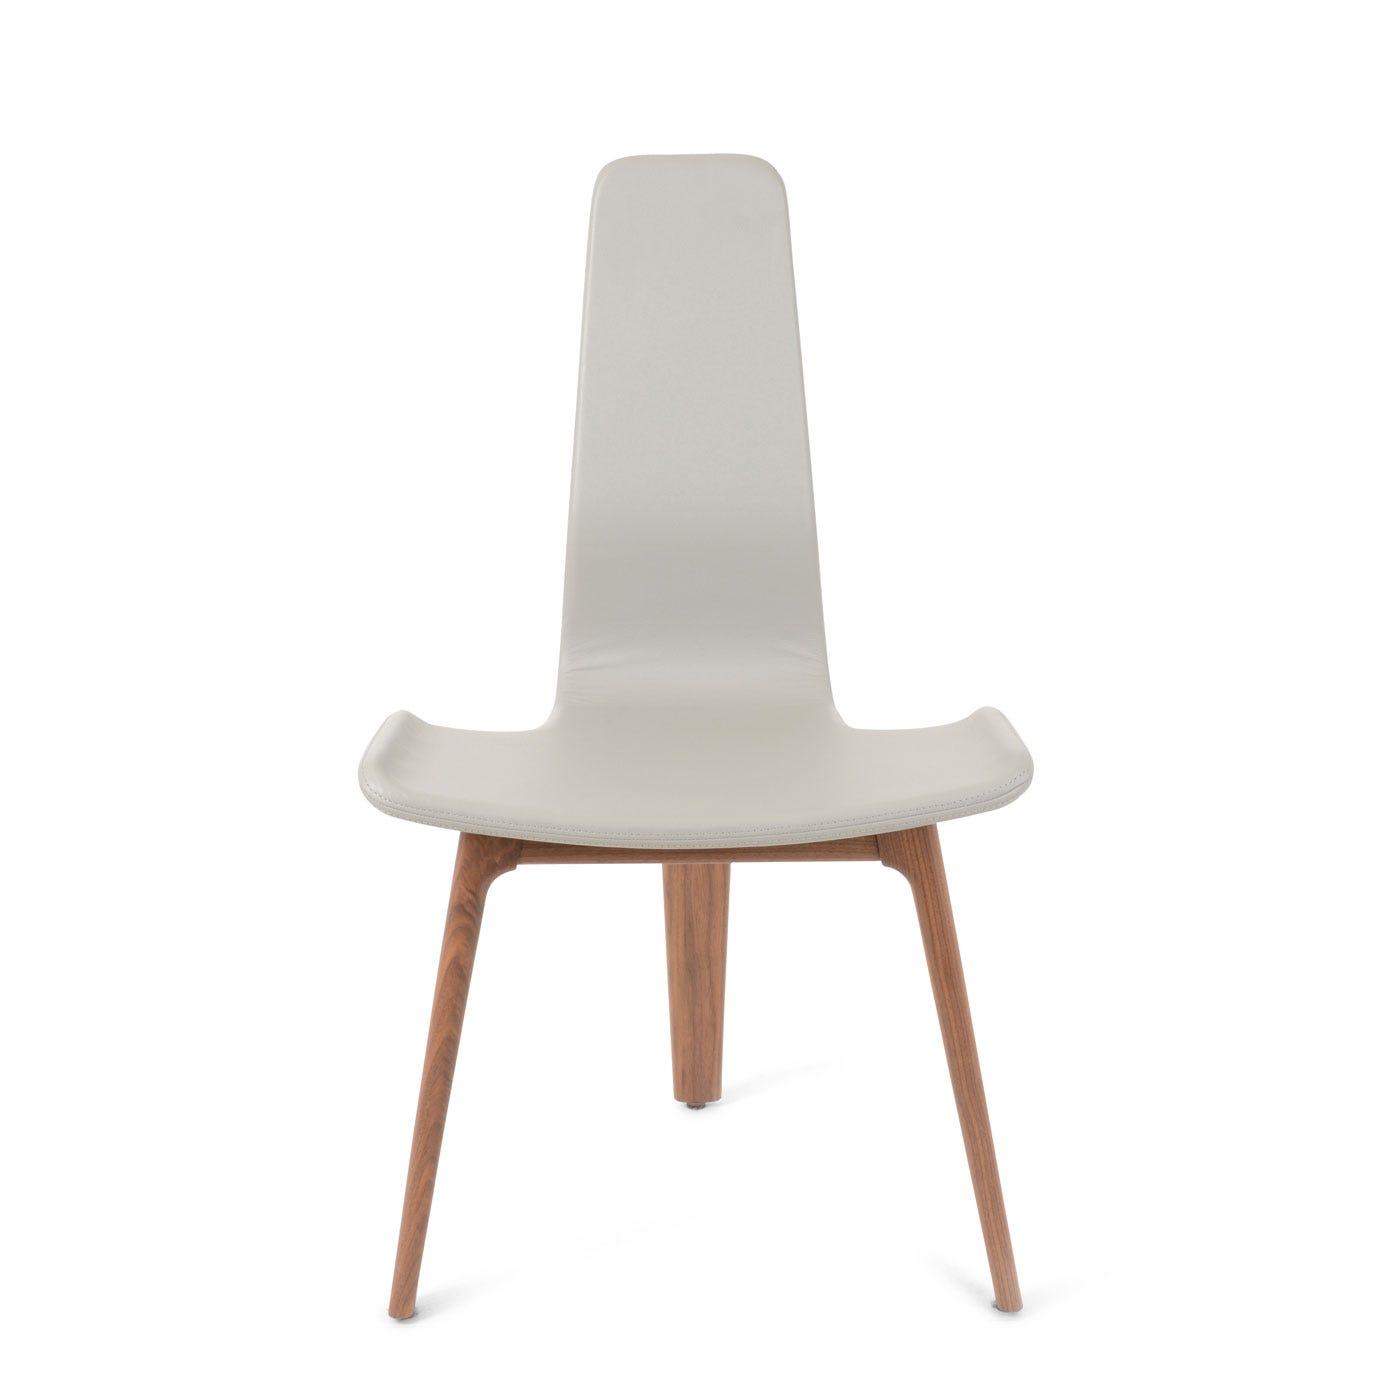 Matthew Hilton Tapas Upholstered Dining Chair Walnut And Fog